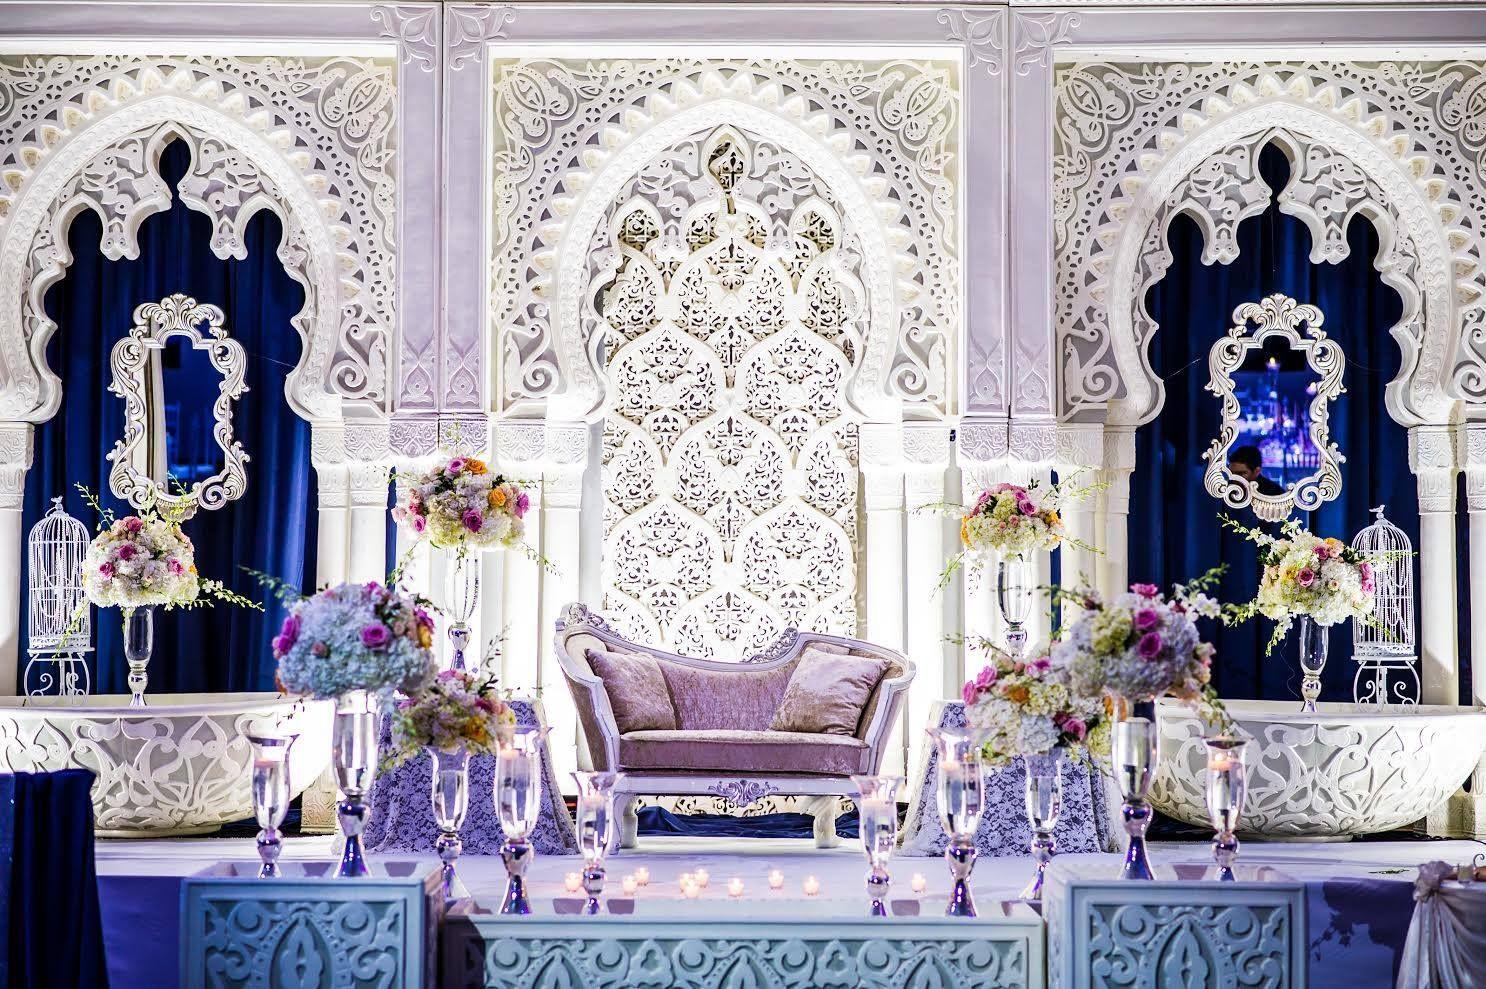 Pin by Gulnaz Sajid on wedding | Wedding stage design ...